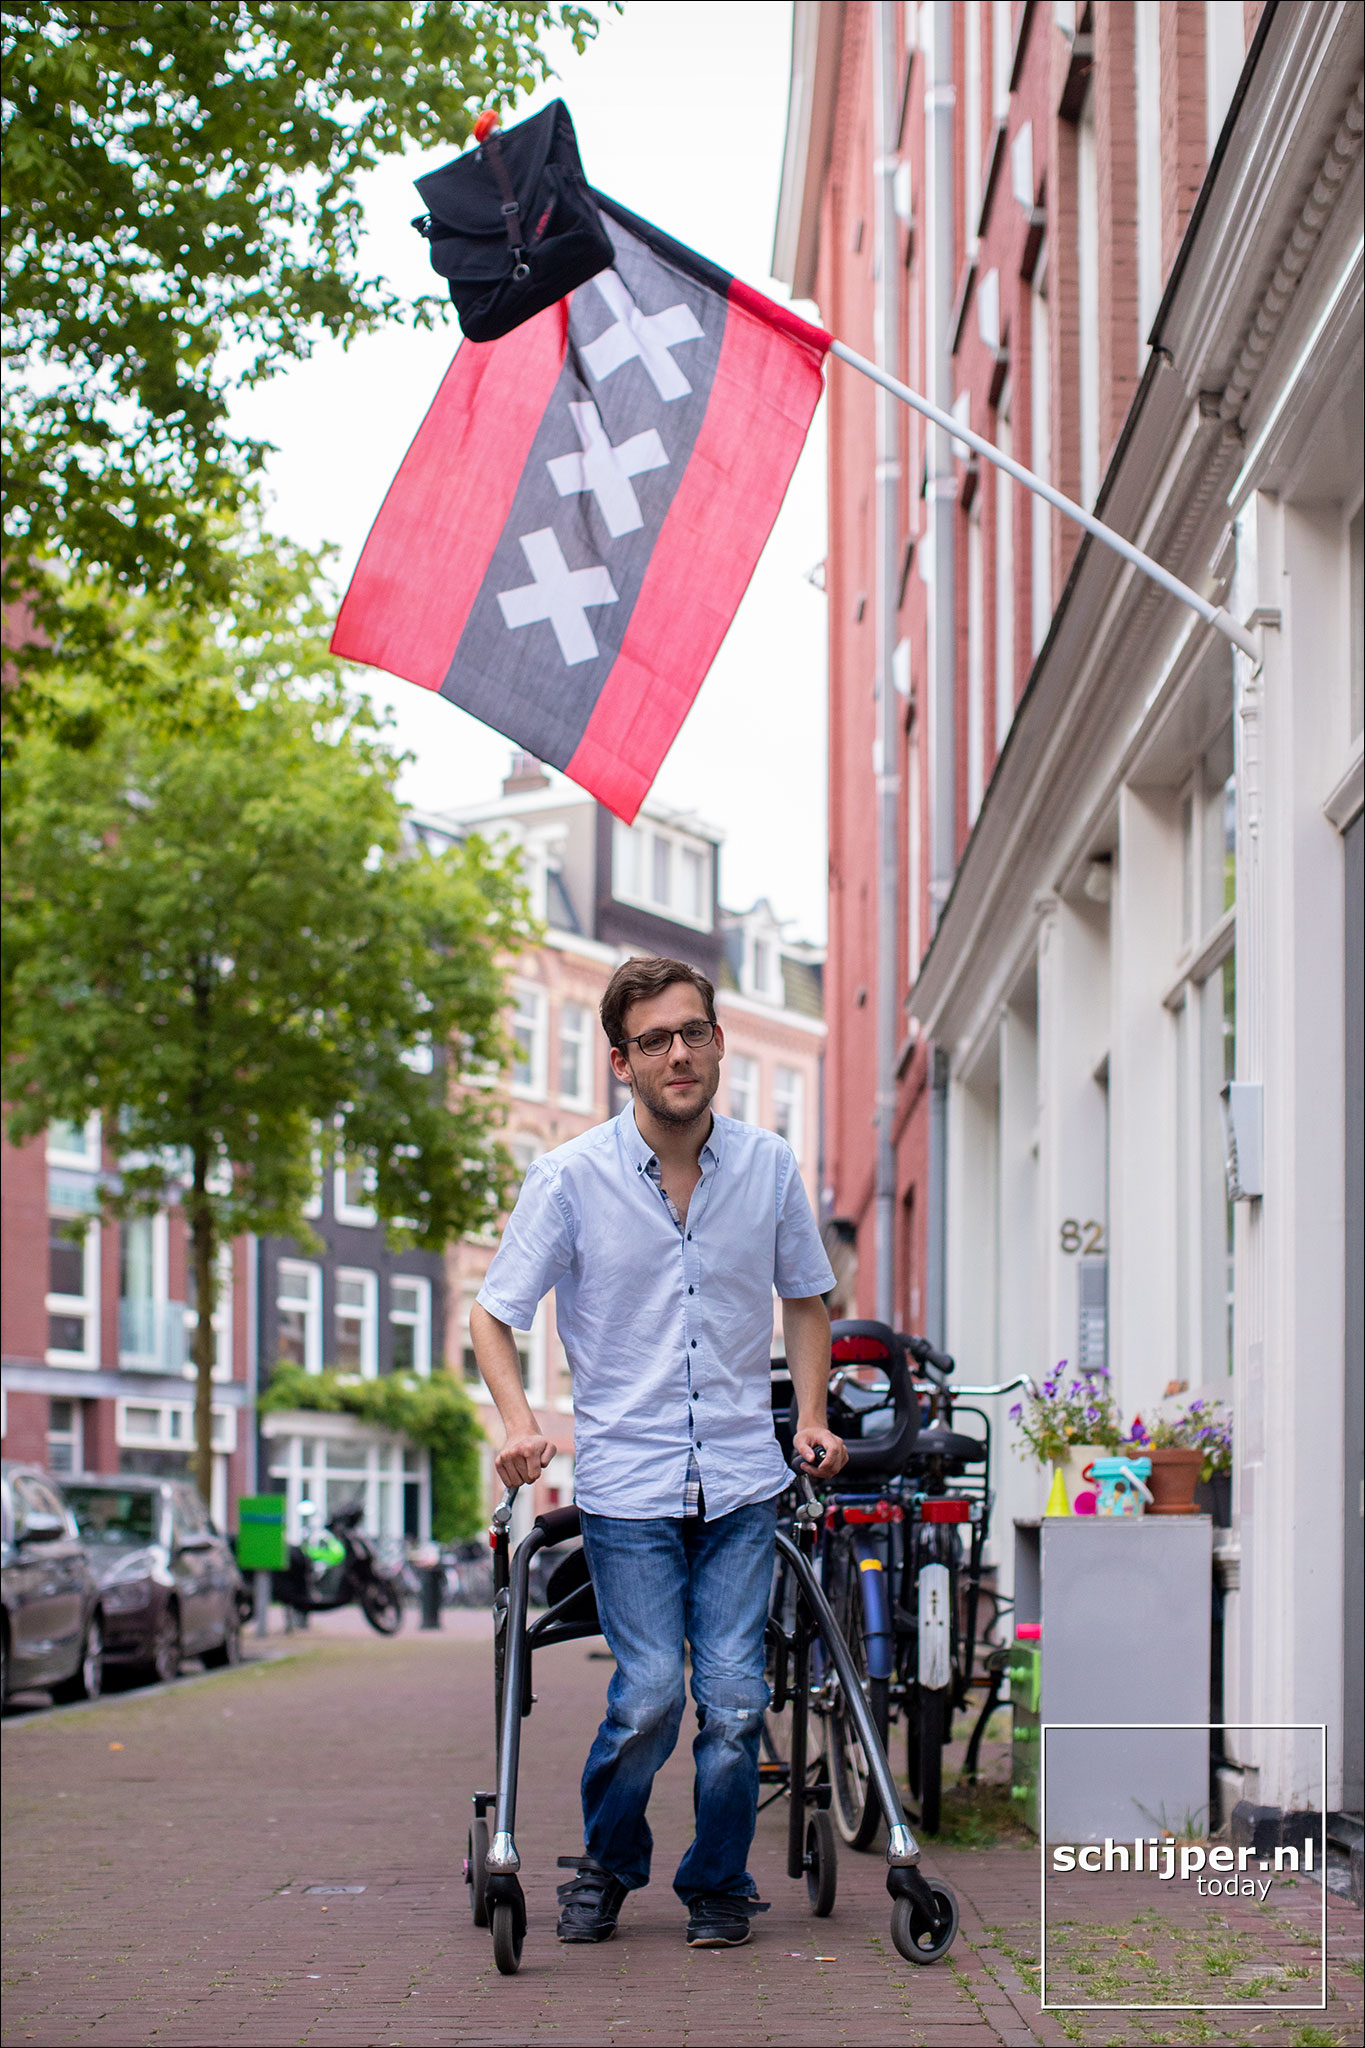 Nederland, Amsterdam, 15 juni 2018